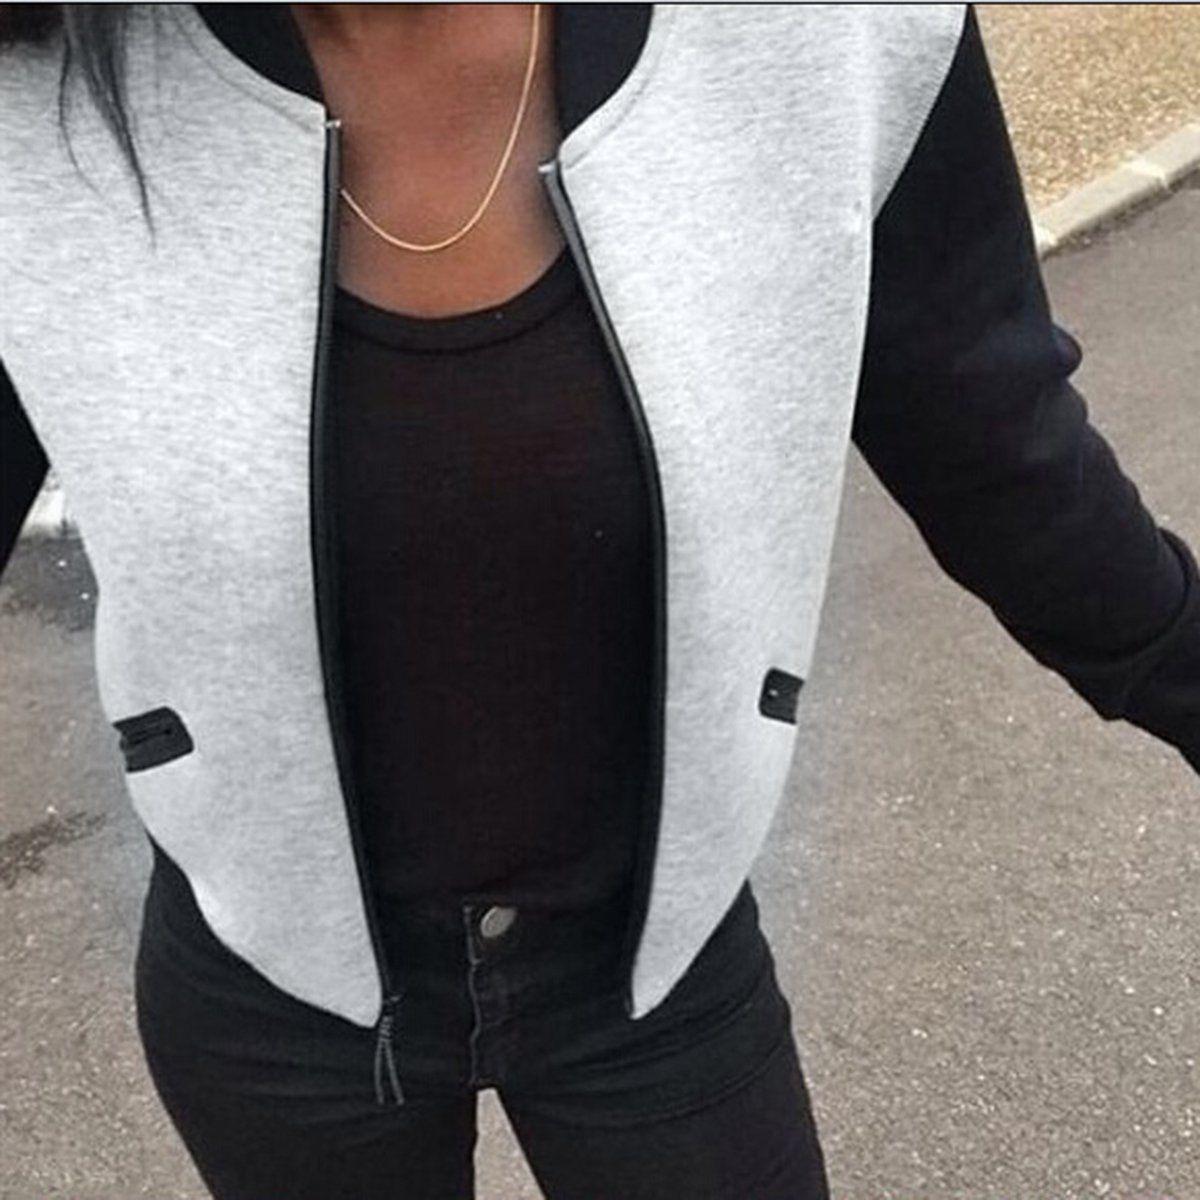 f76ebff7efb Puseky 2018 Hot Sale Fashion Womens Bomber Jacket Vintage Zip Up Biker  Stylish Padded Zipper Coat Top Blouse Autumn Winter Coats L18101001 Ladies  Jackets ...